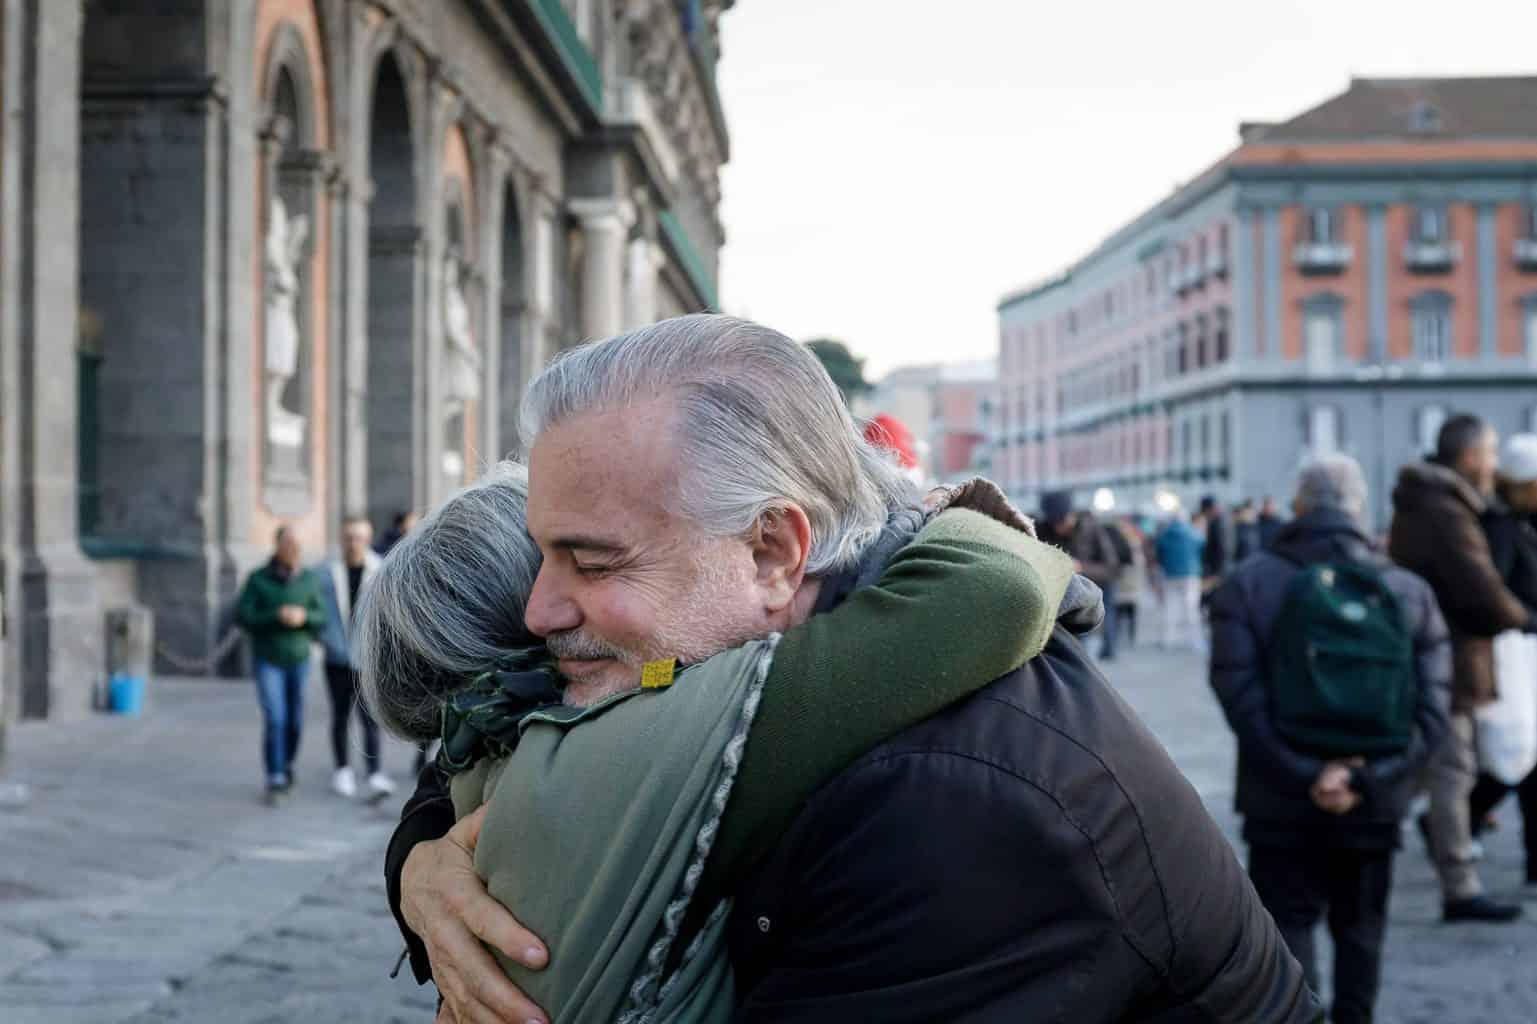 embrace, hug, solidarity